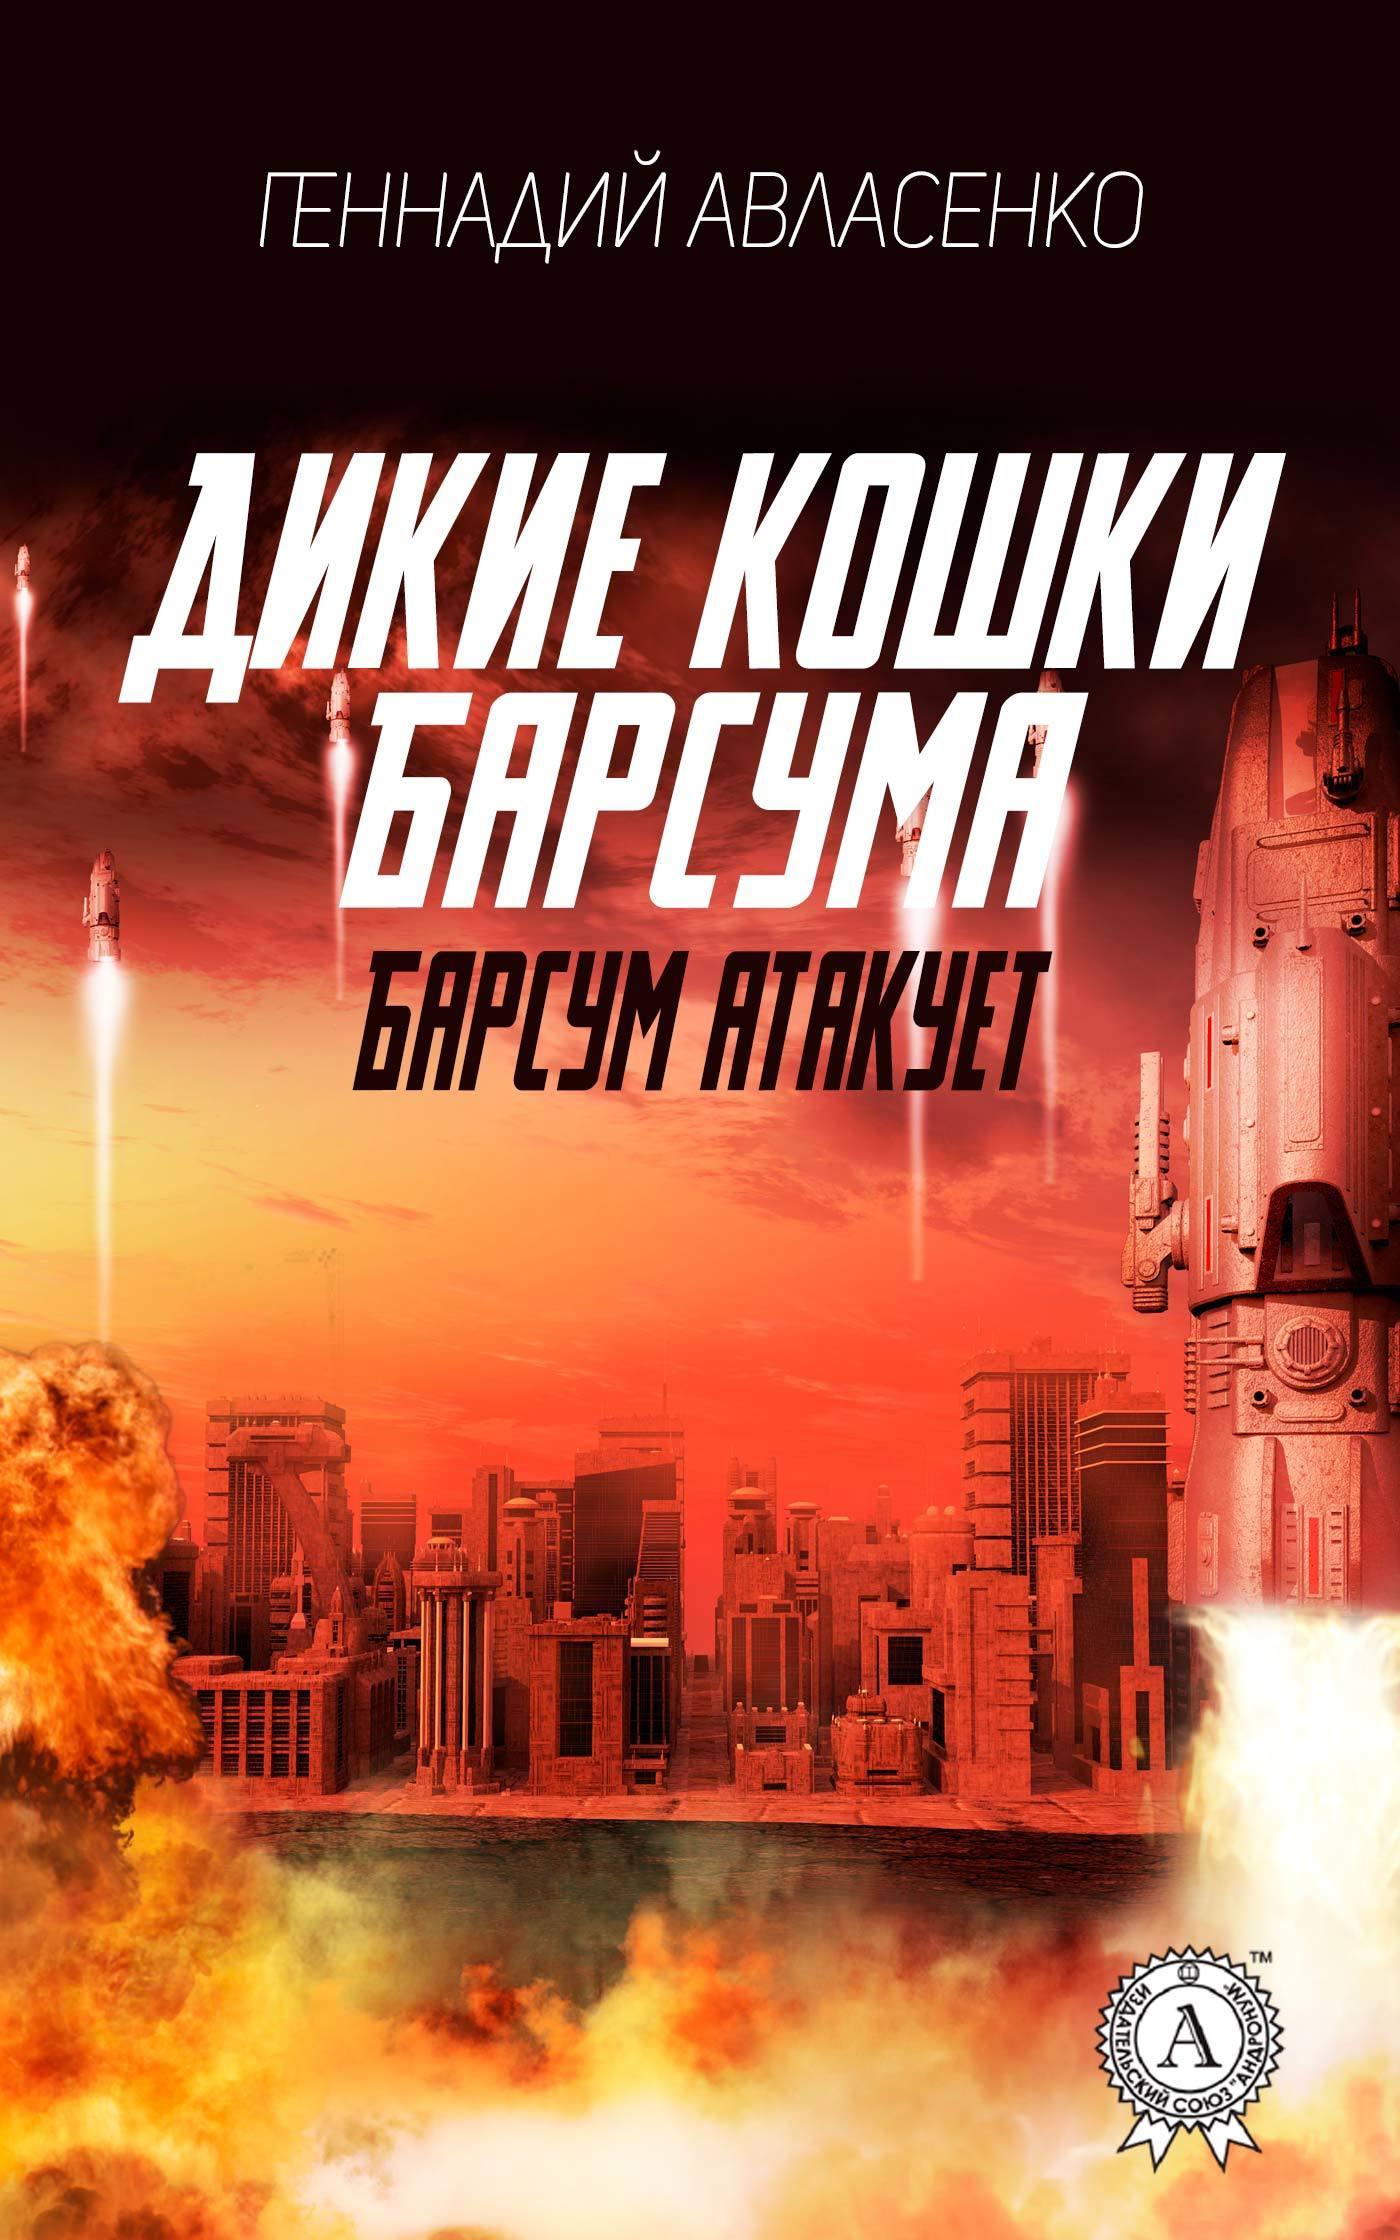 Геннадий Авласенко - Барсум атакует